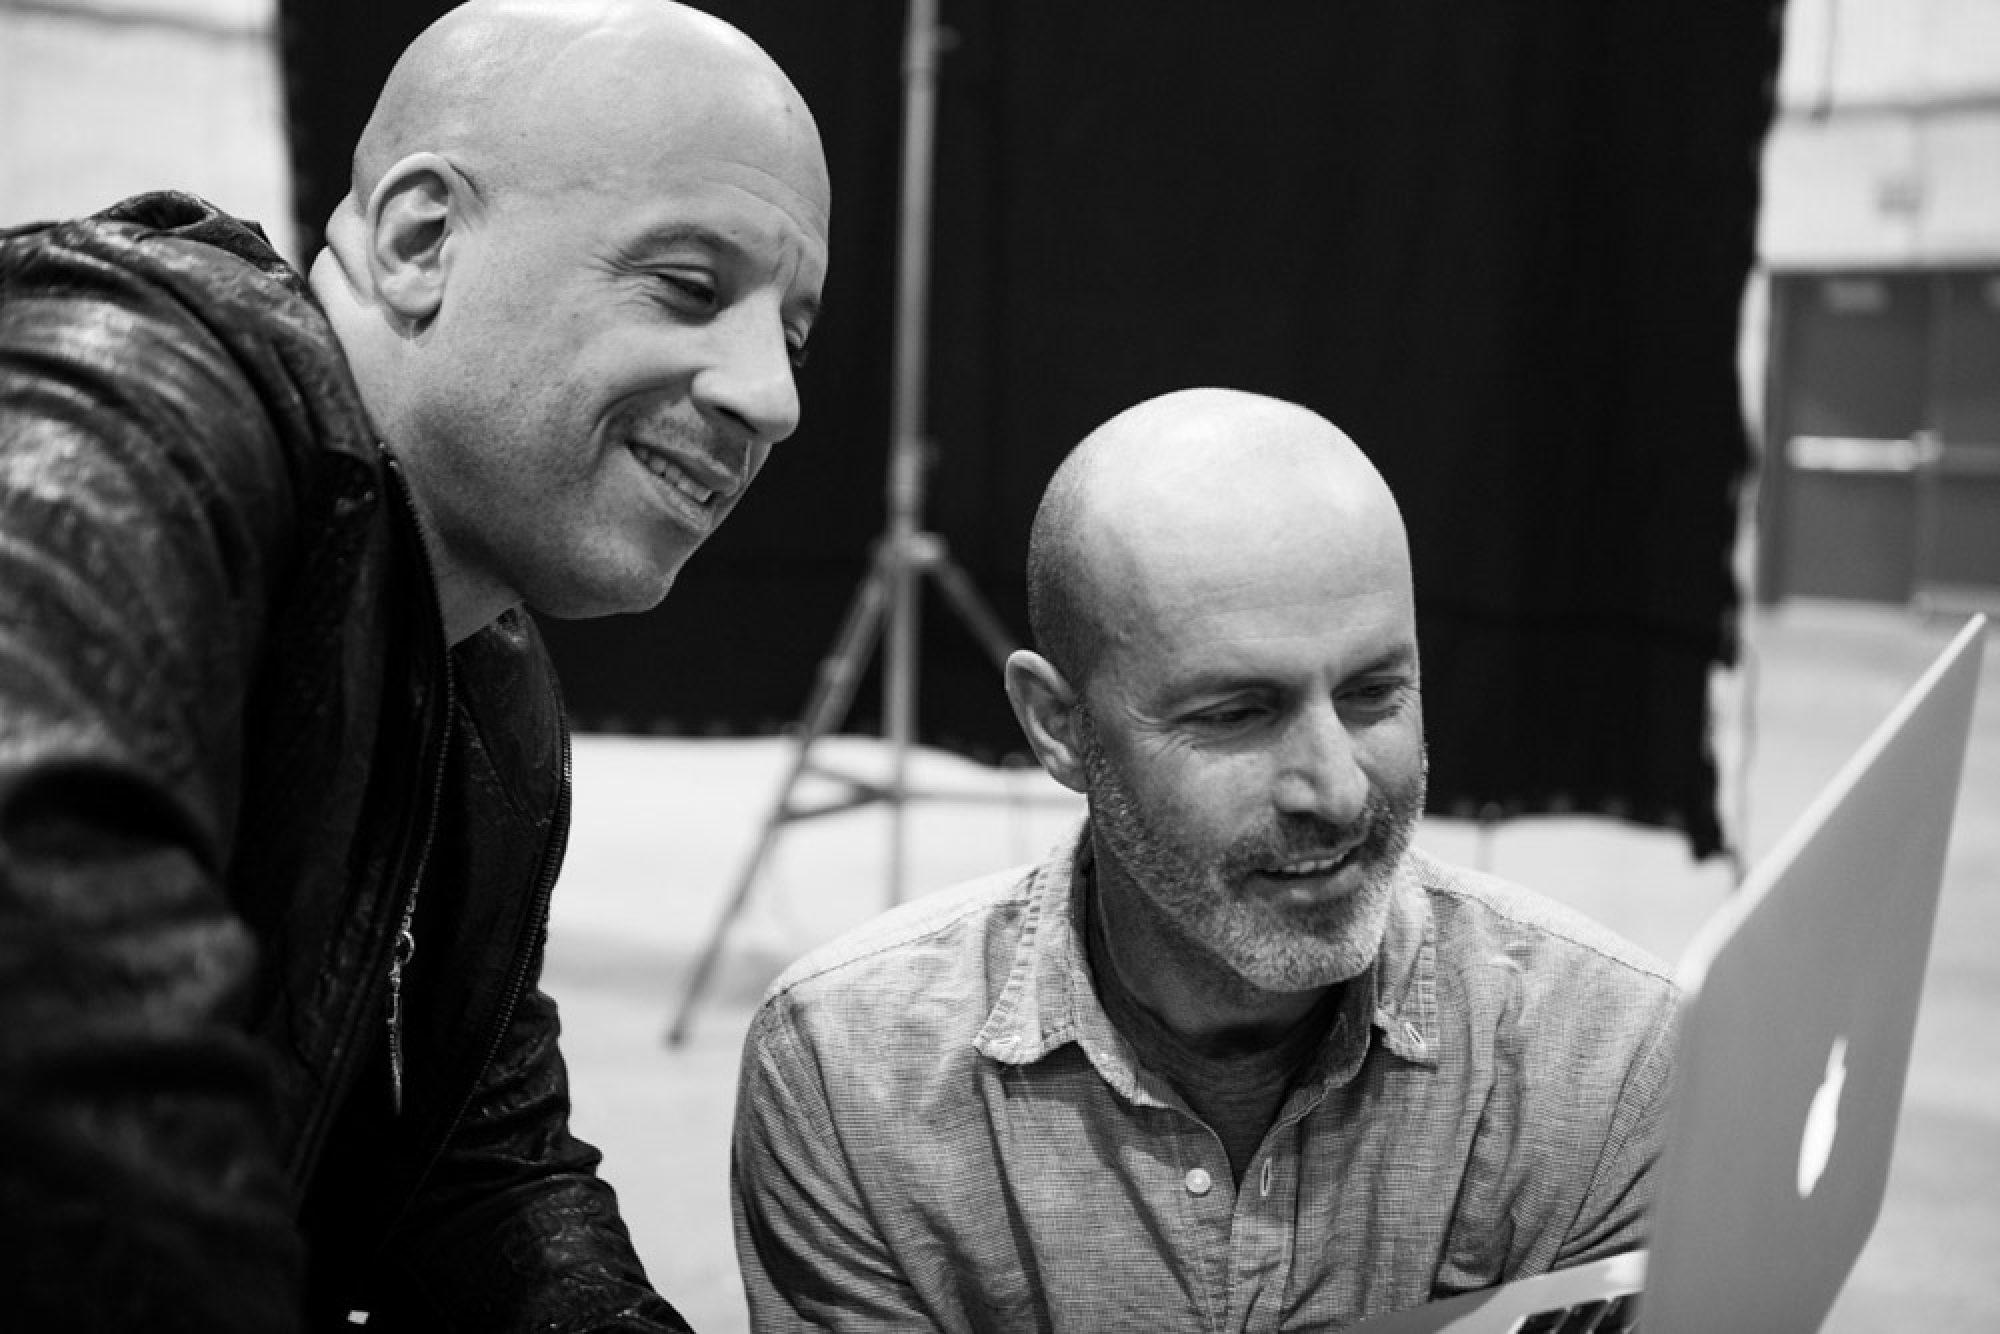 XXX Return of Xander Cage-Vin Diesel / D.J. Caruso